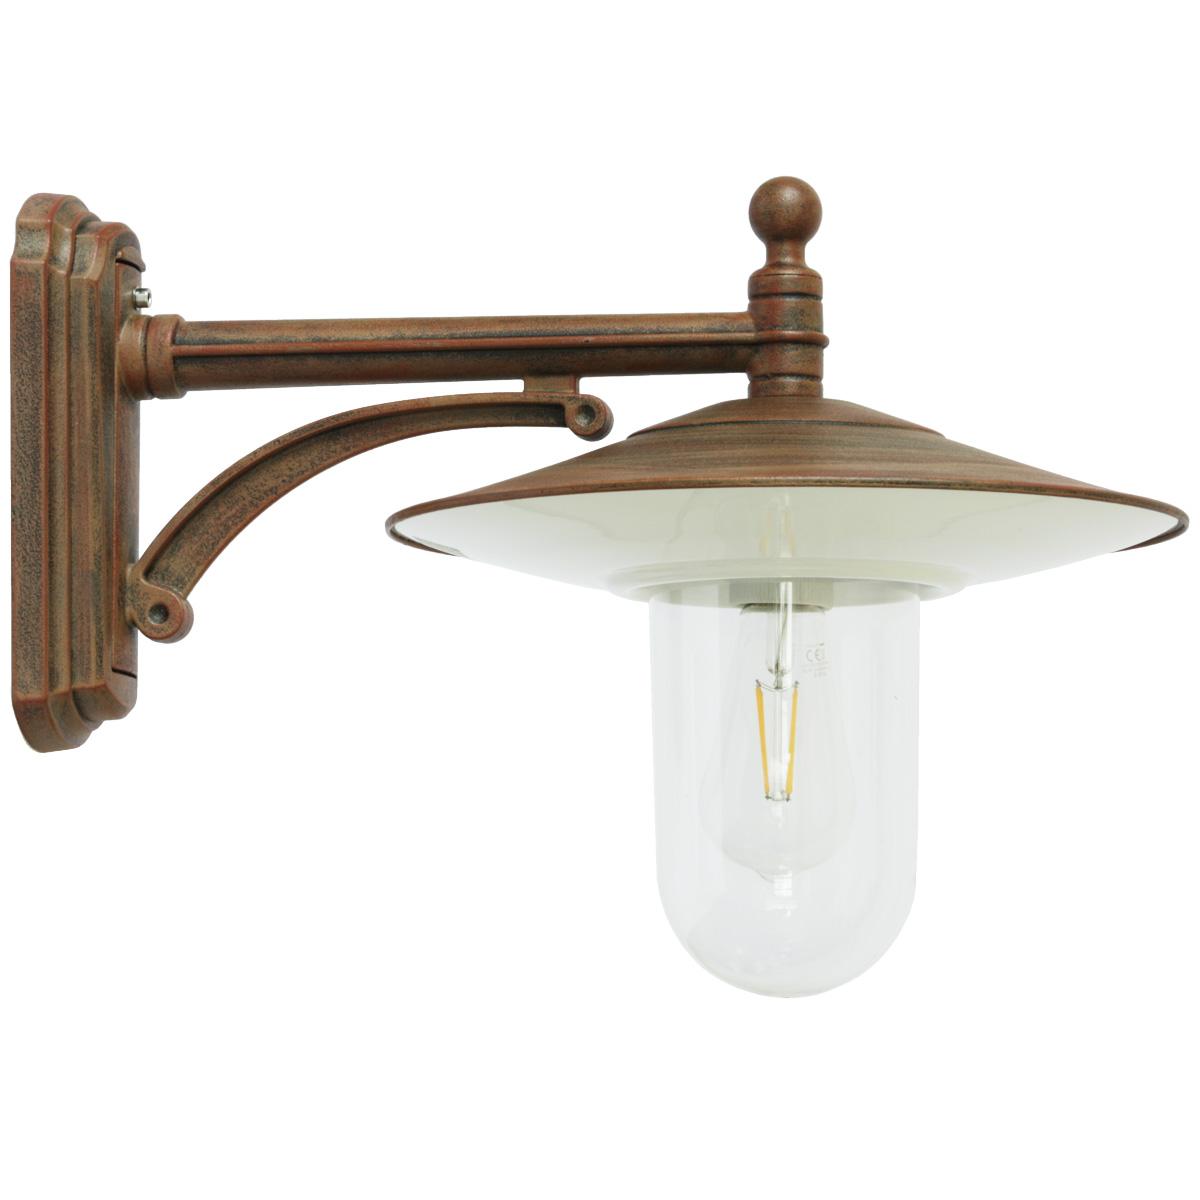 Aussenleuchte Wandlampe klassische Wandleuchte Aussenwandlampe Aussenlampe Glas